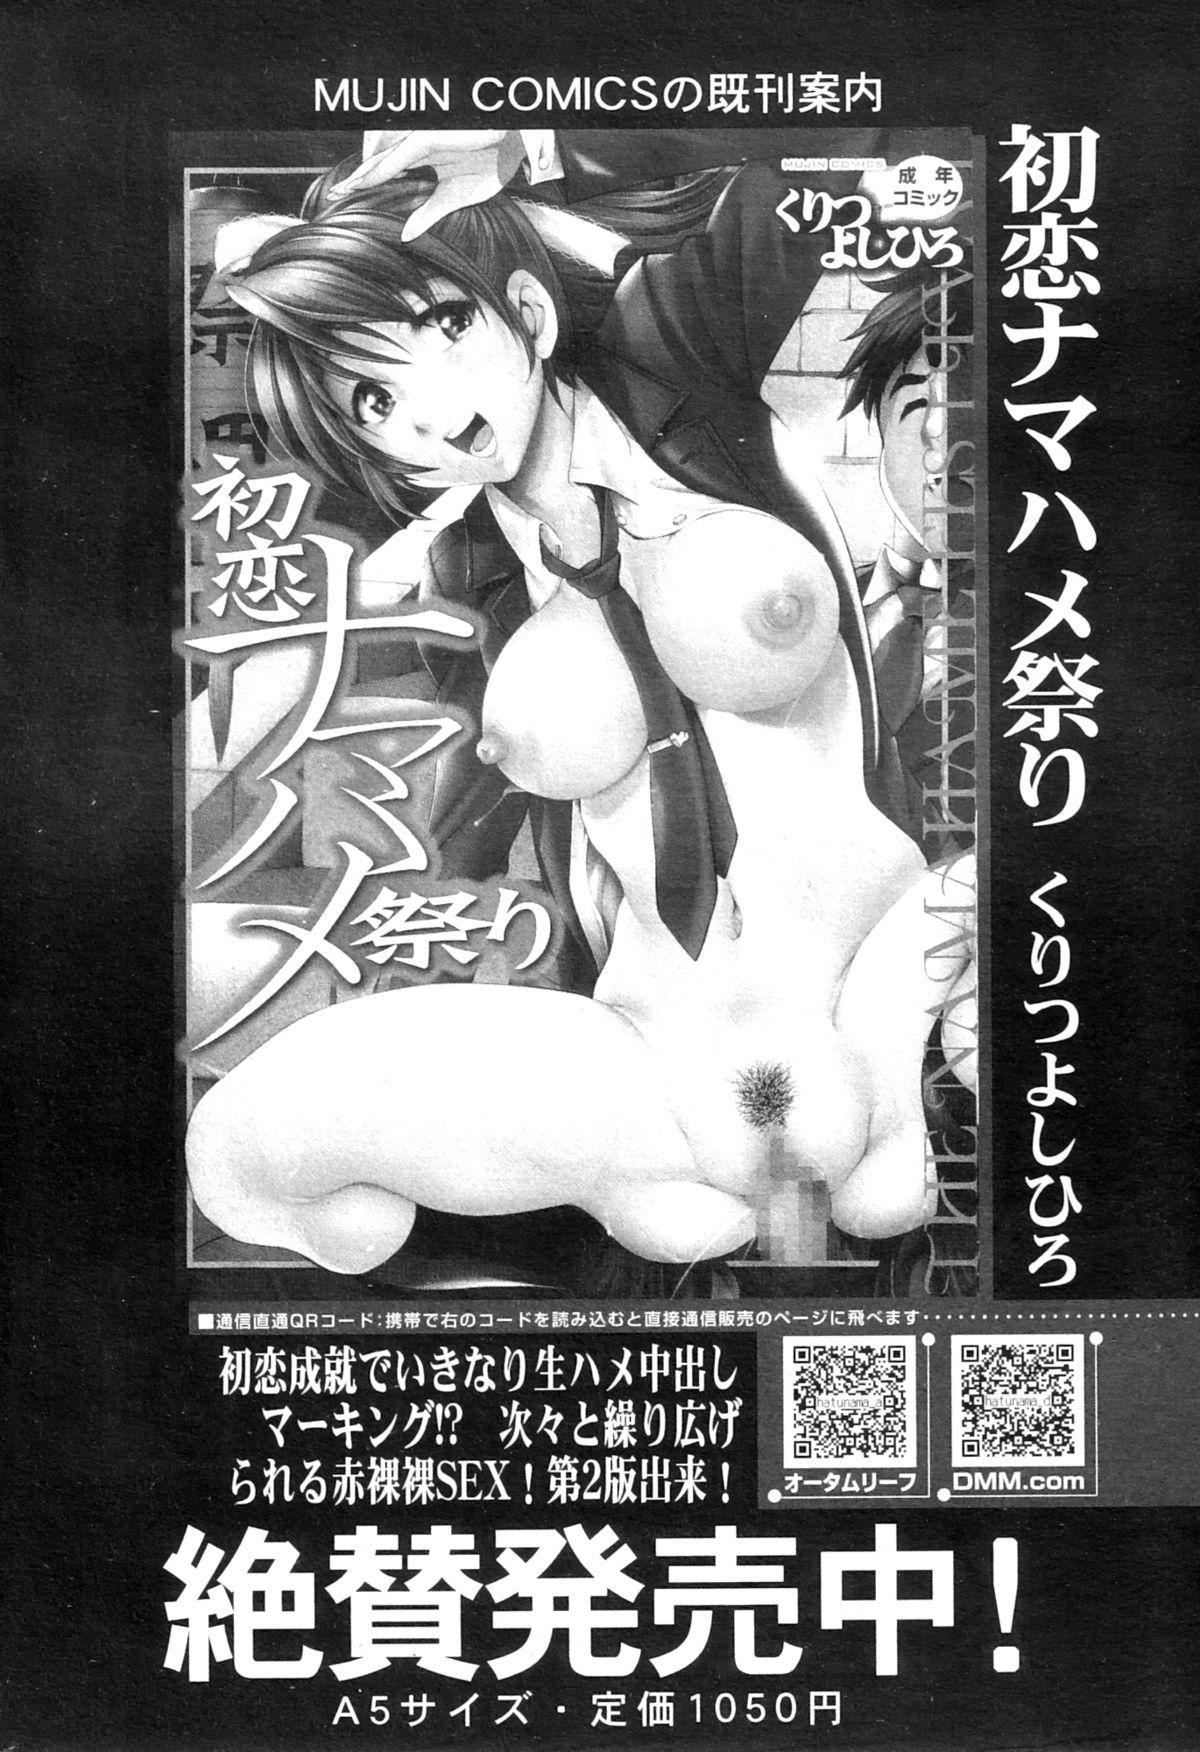 COMIC MILF 2013-02 Vol. 11 290